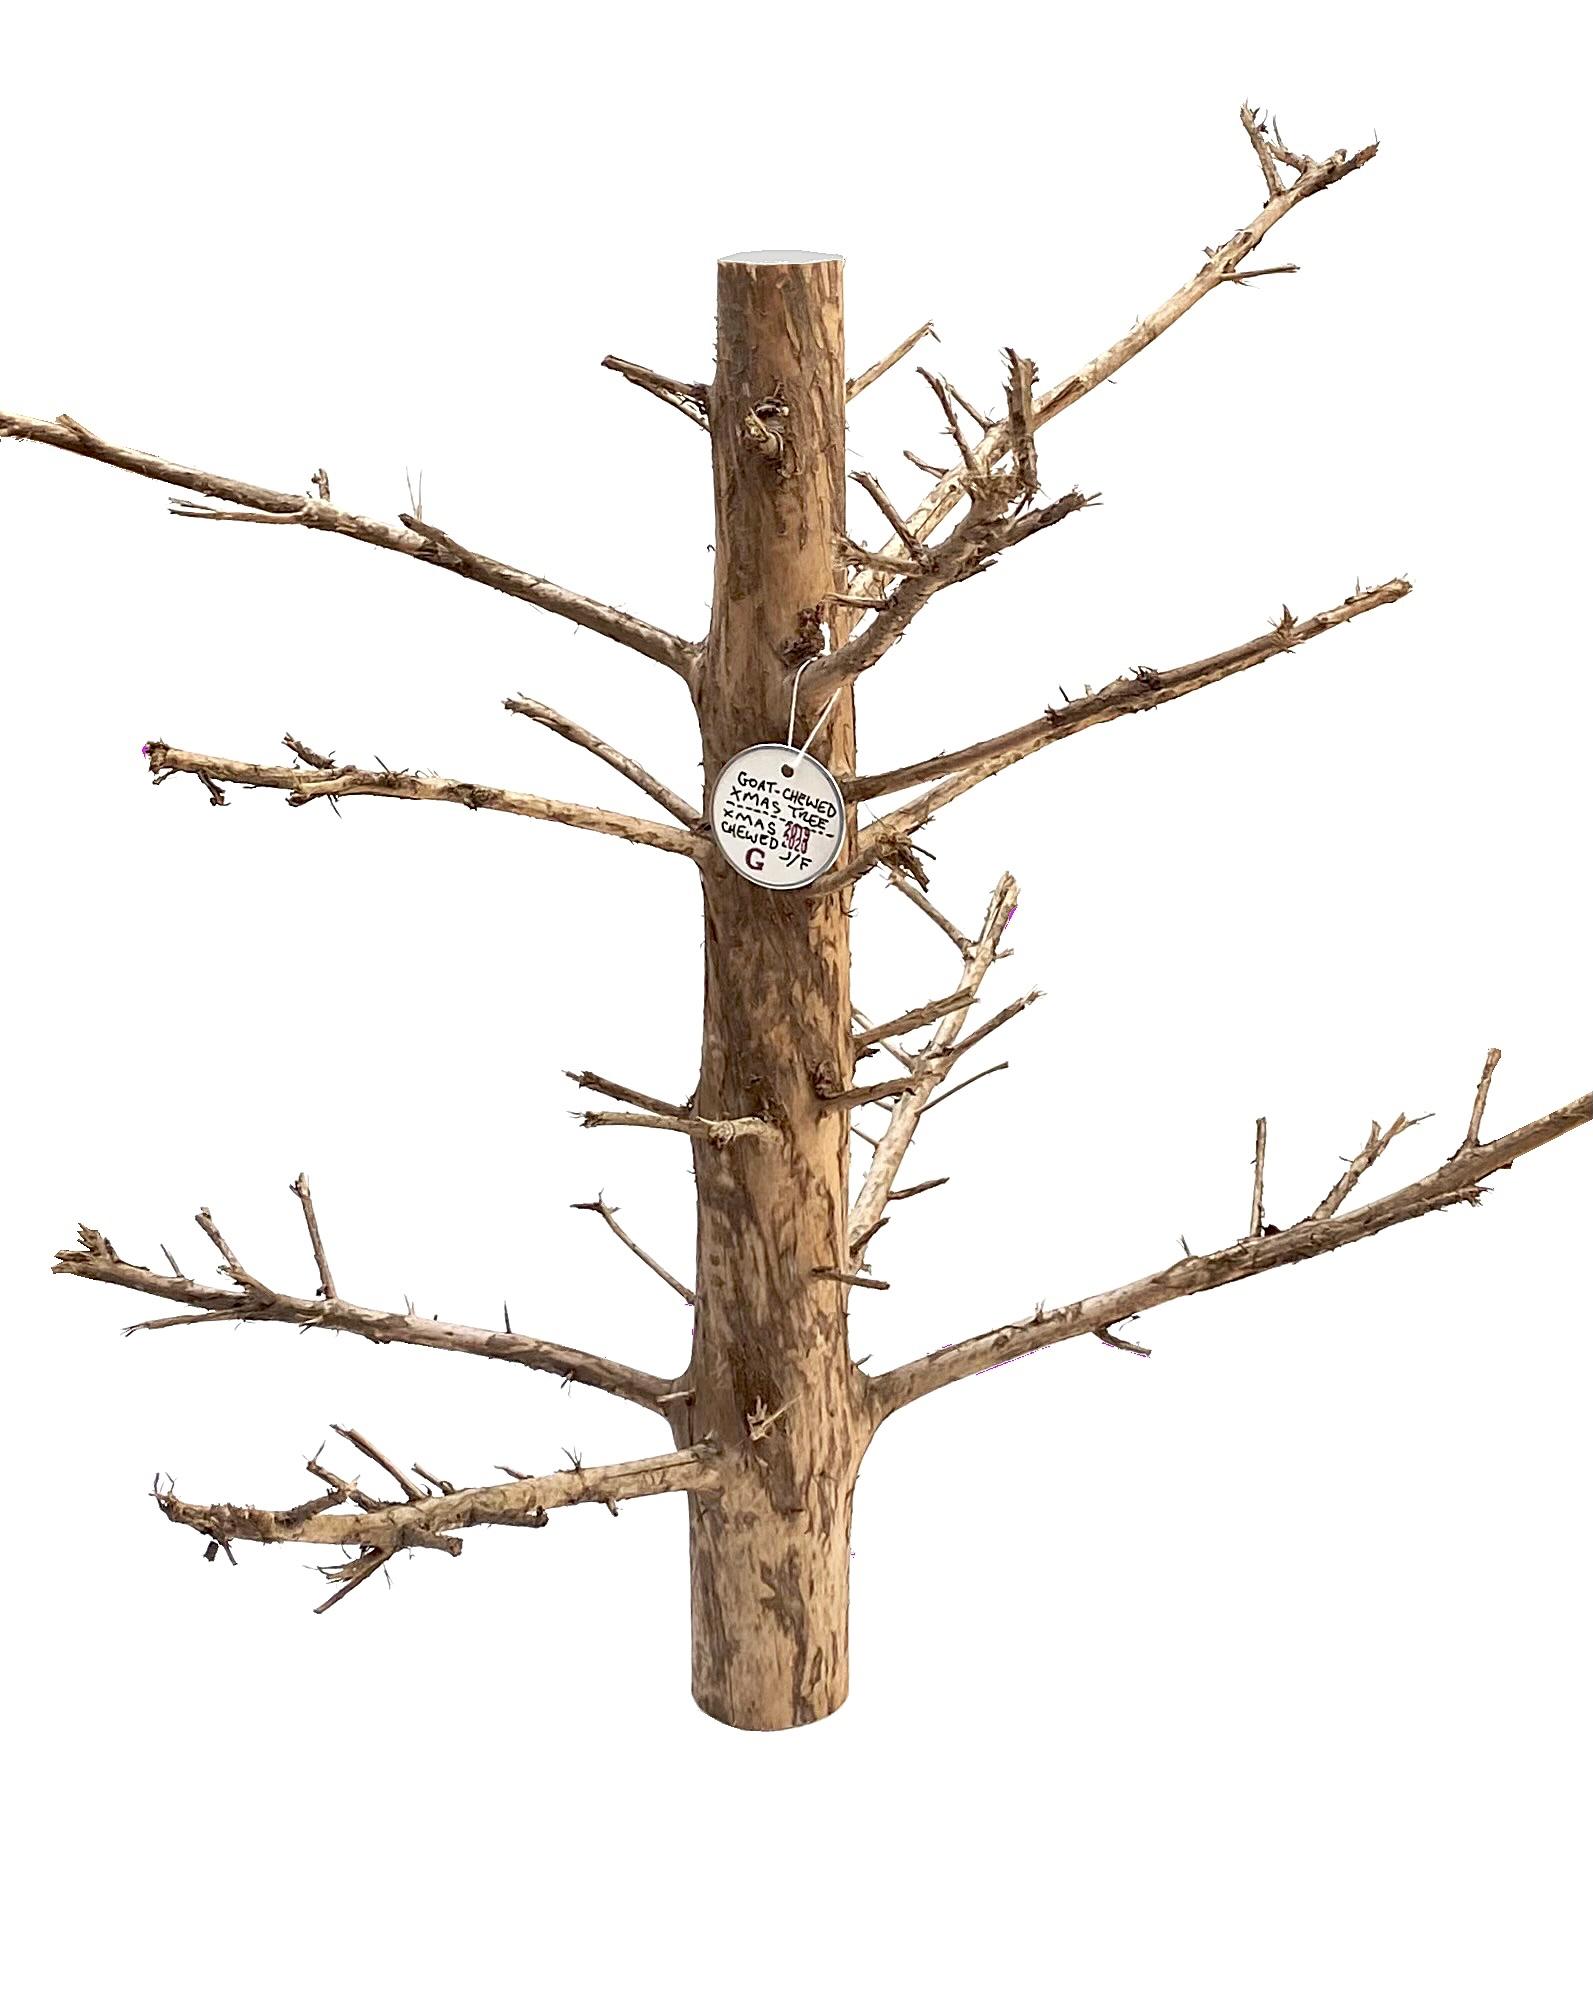 2019 - 2020 goat-chewed xmas tree